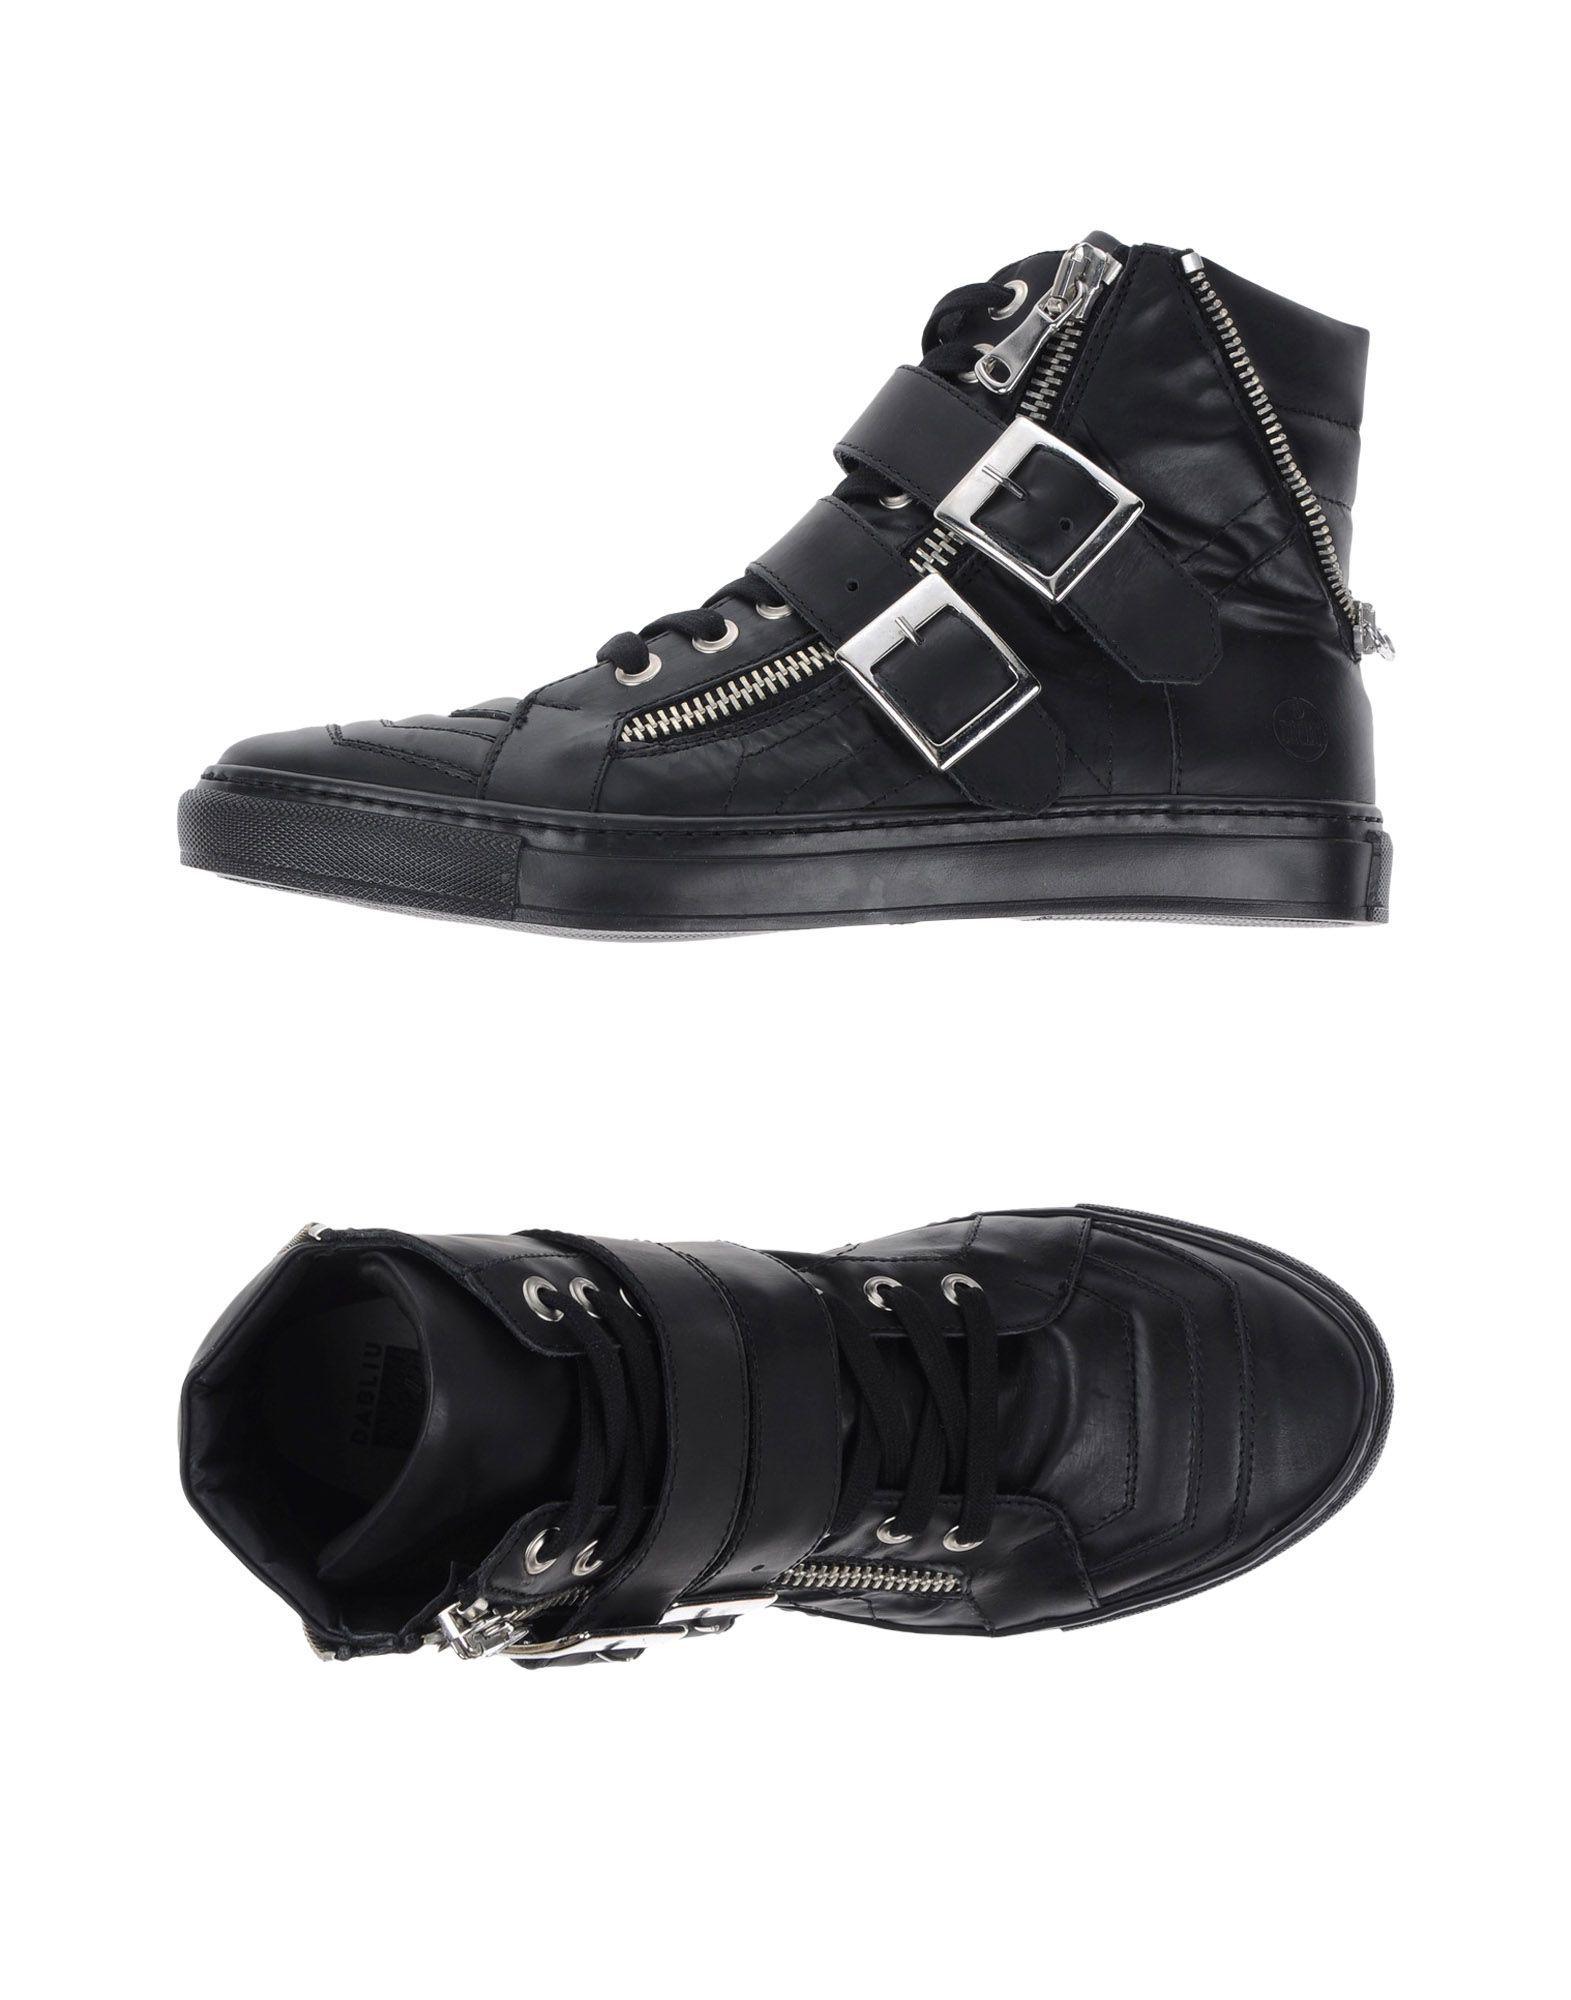 W Dabliu Haute-dessus Et Chaussures De Sport zOD36xxEu